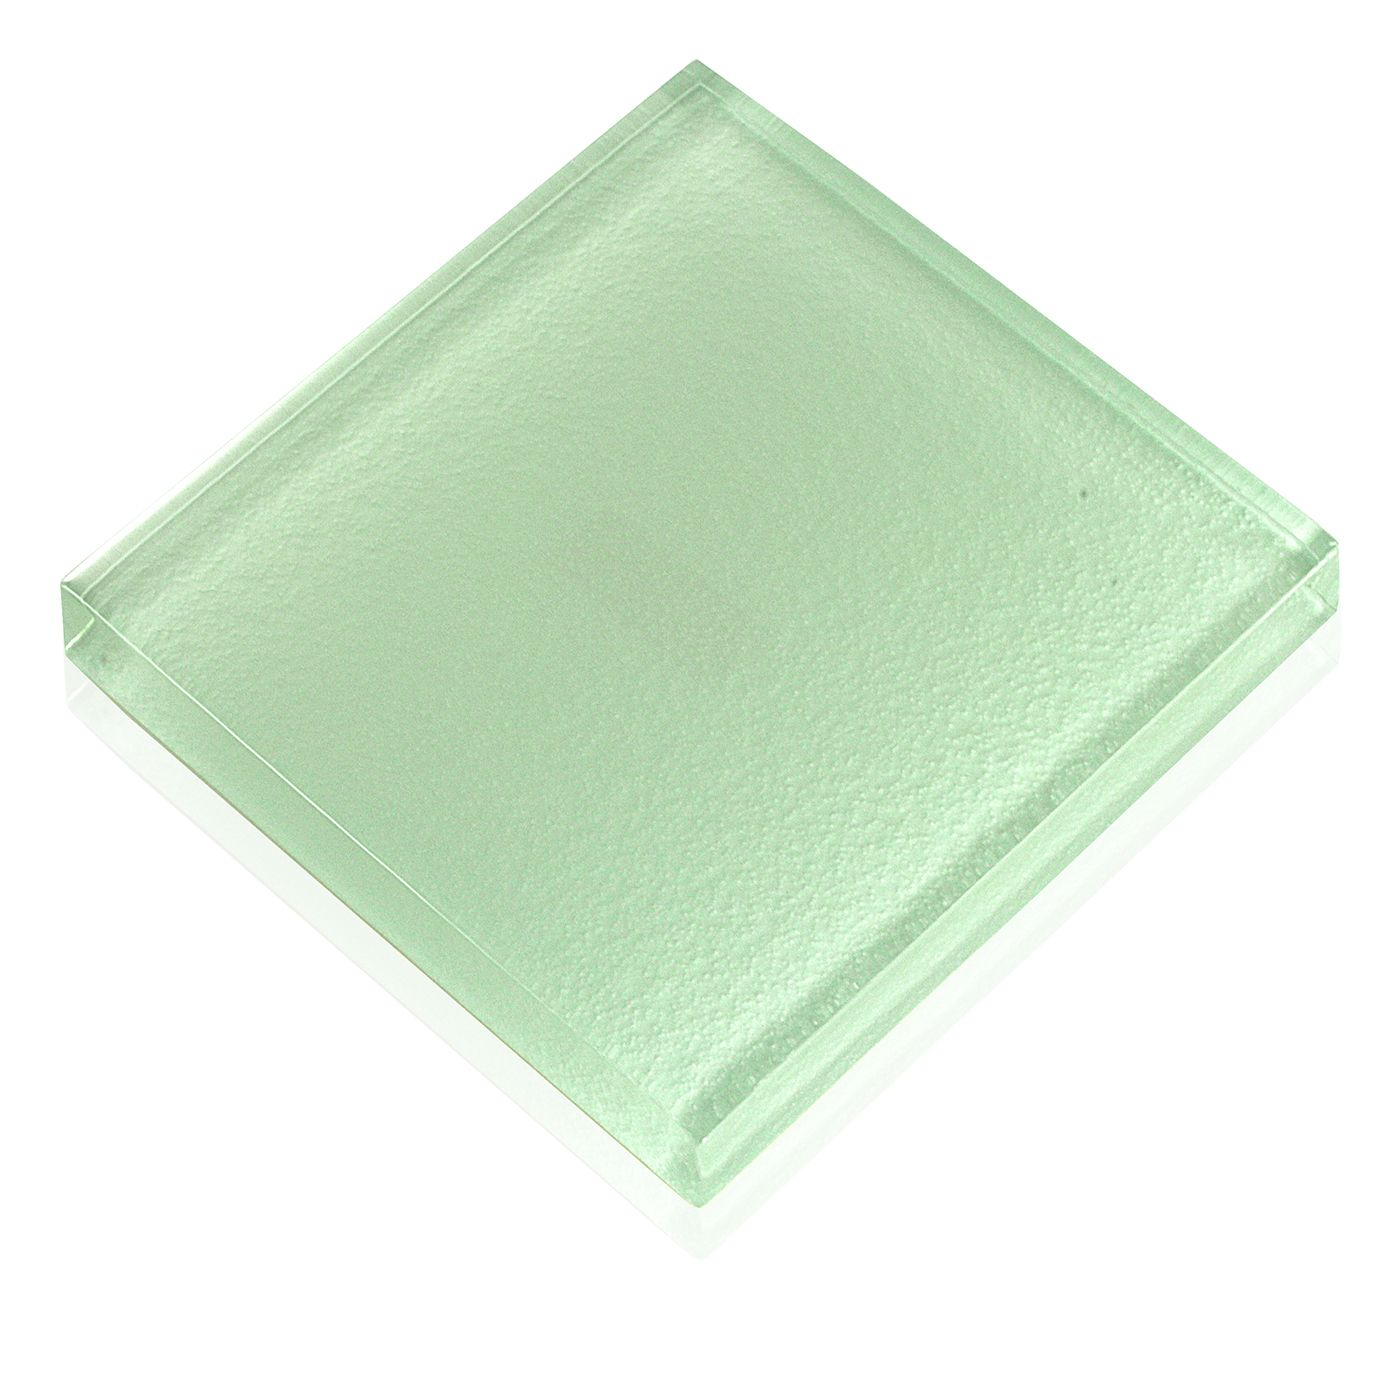 Villi Gl Usa Unicolor Glossy 0015 Ice